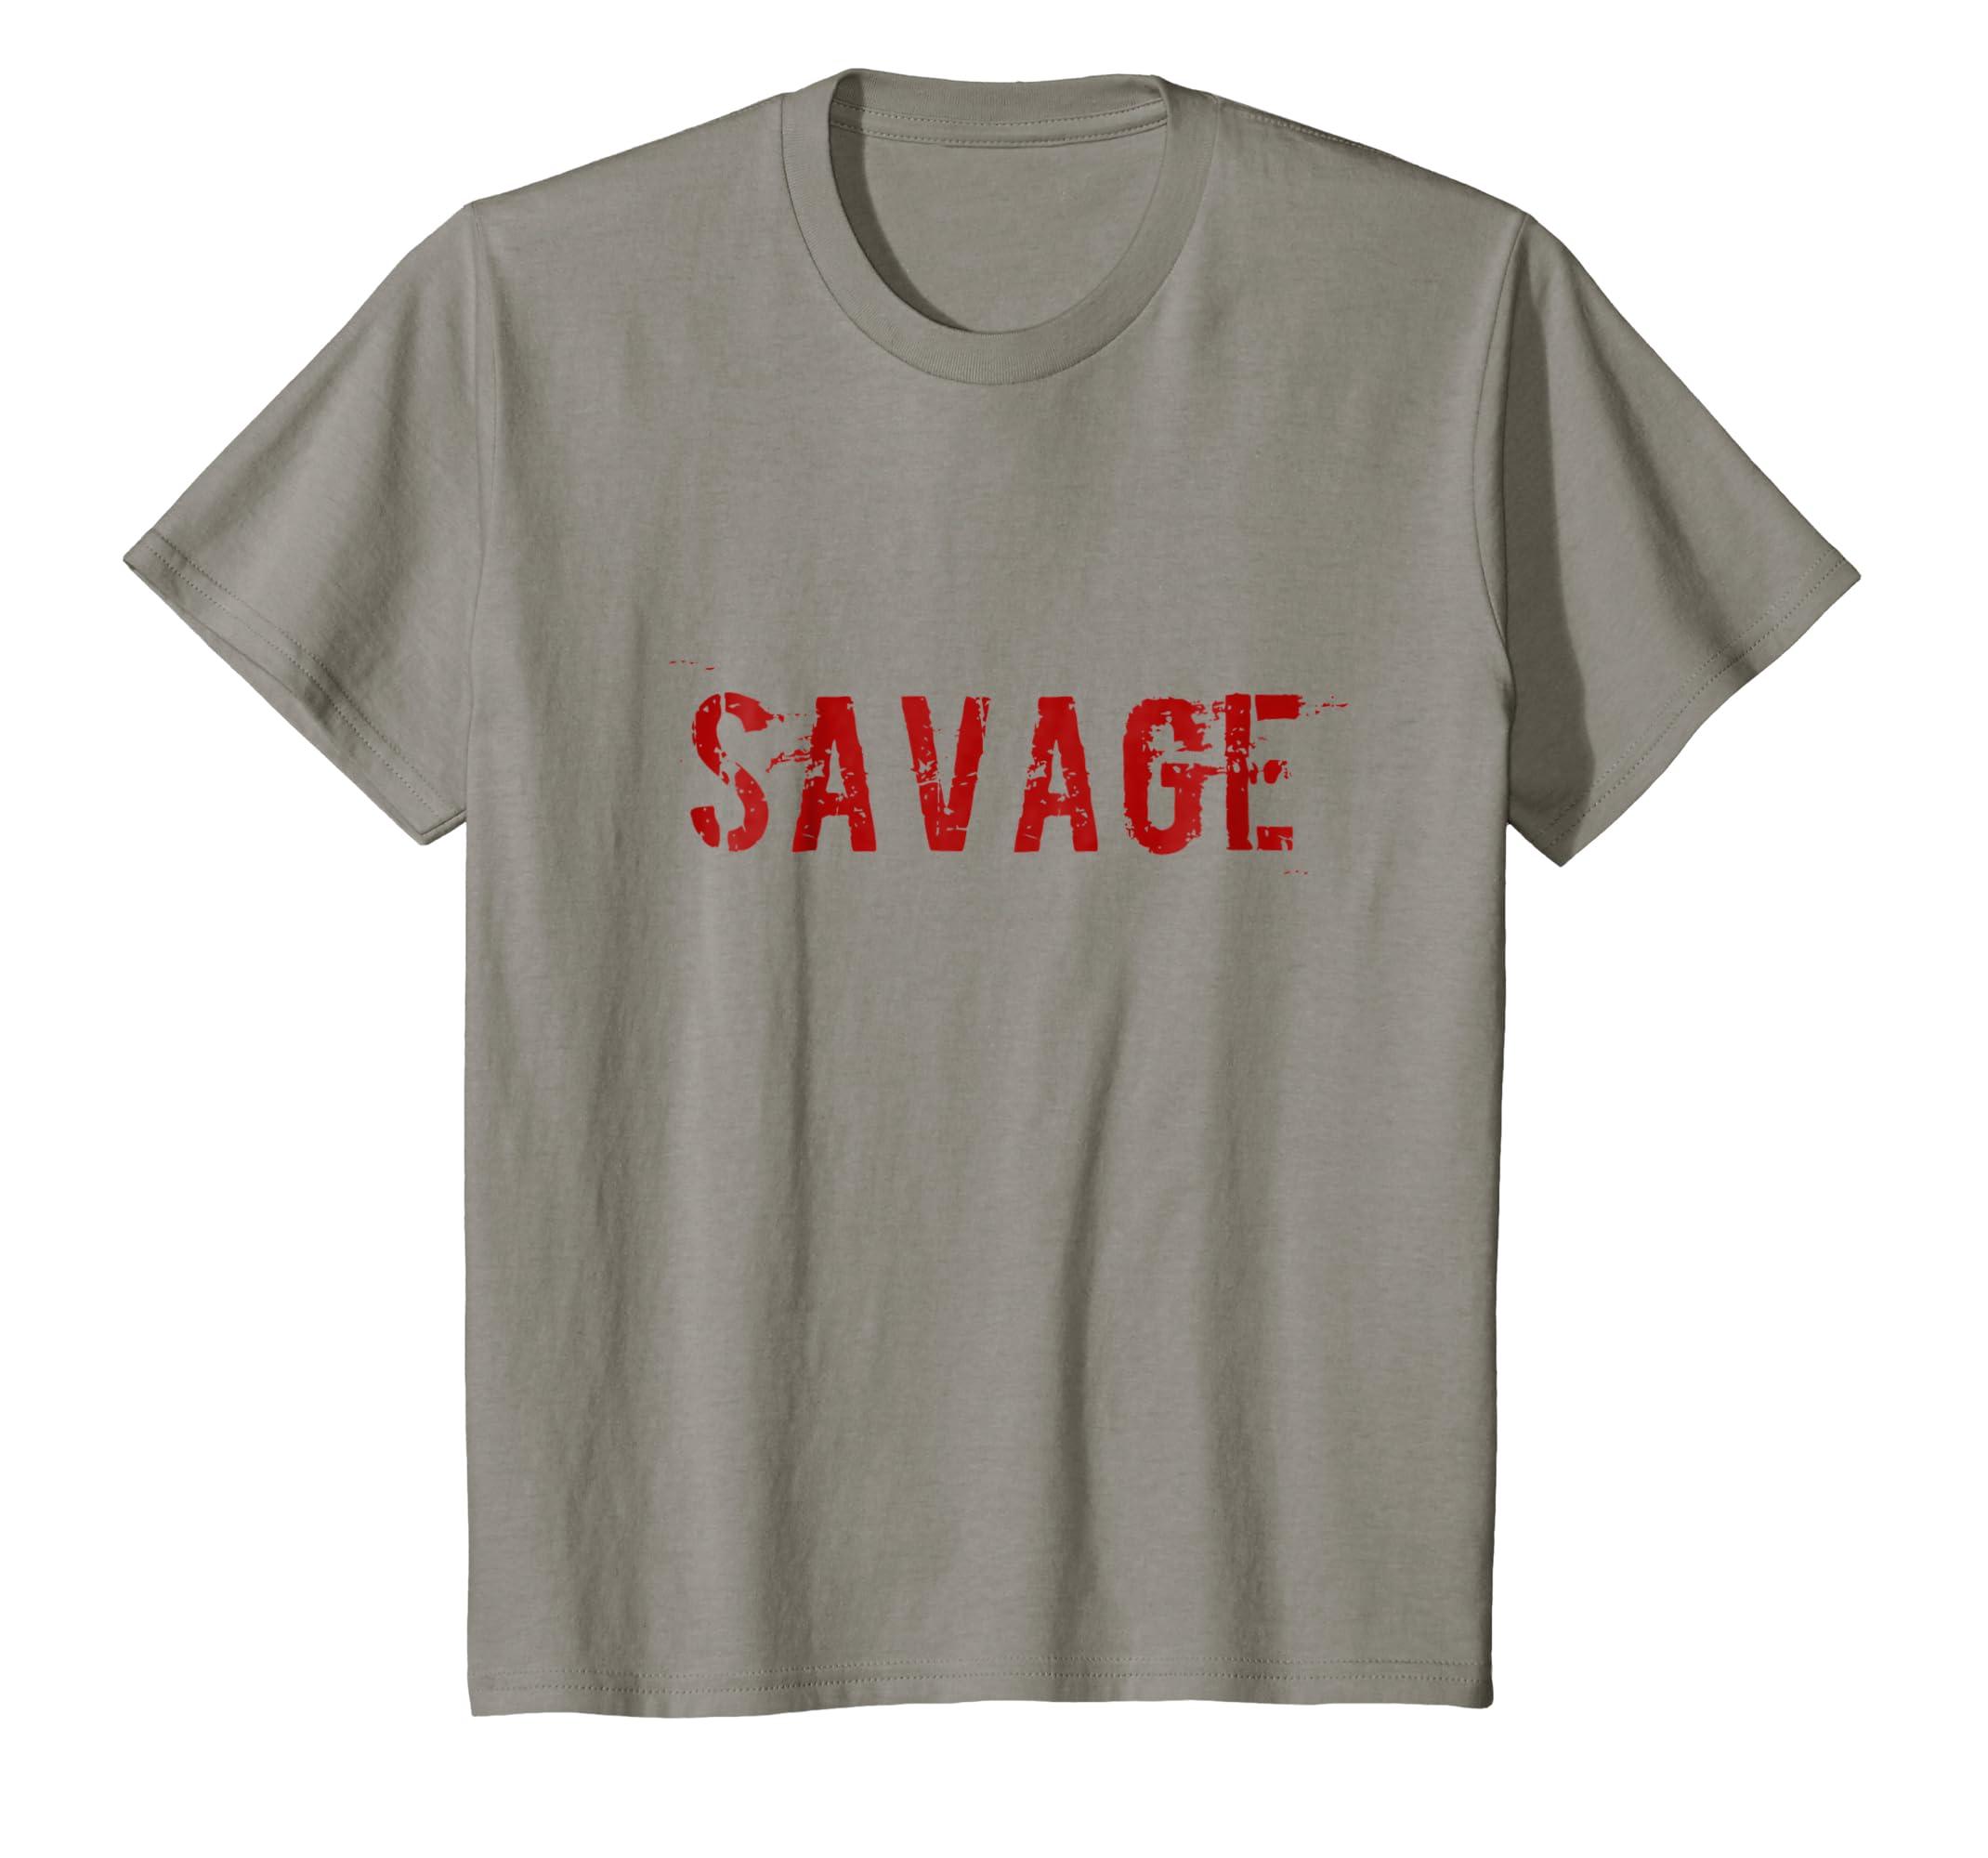 c0d972ca8 Amazon.com: Savage T-Shirt: Clothing